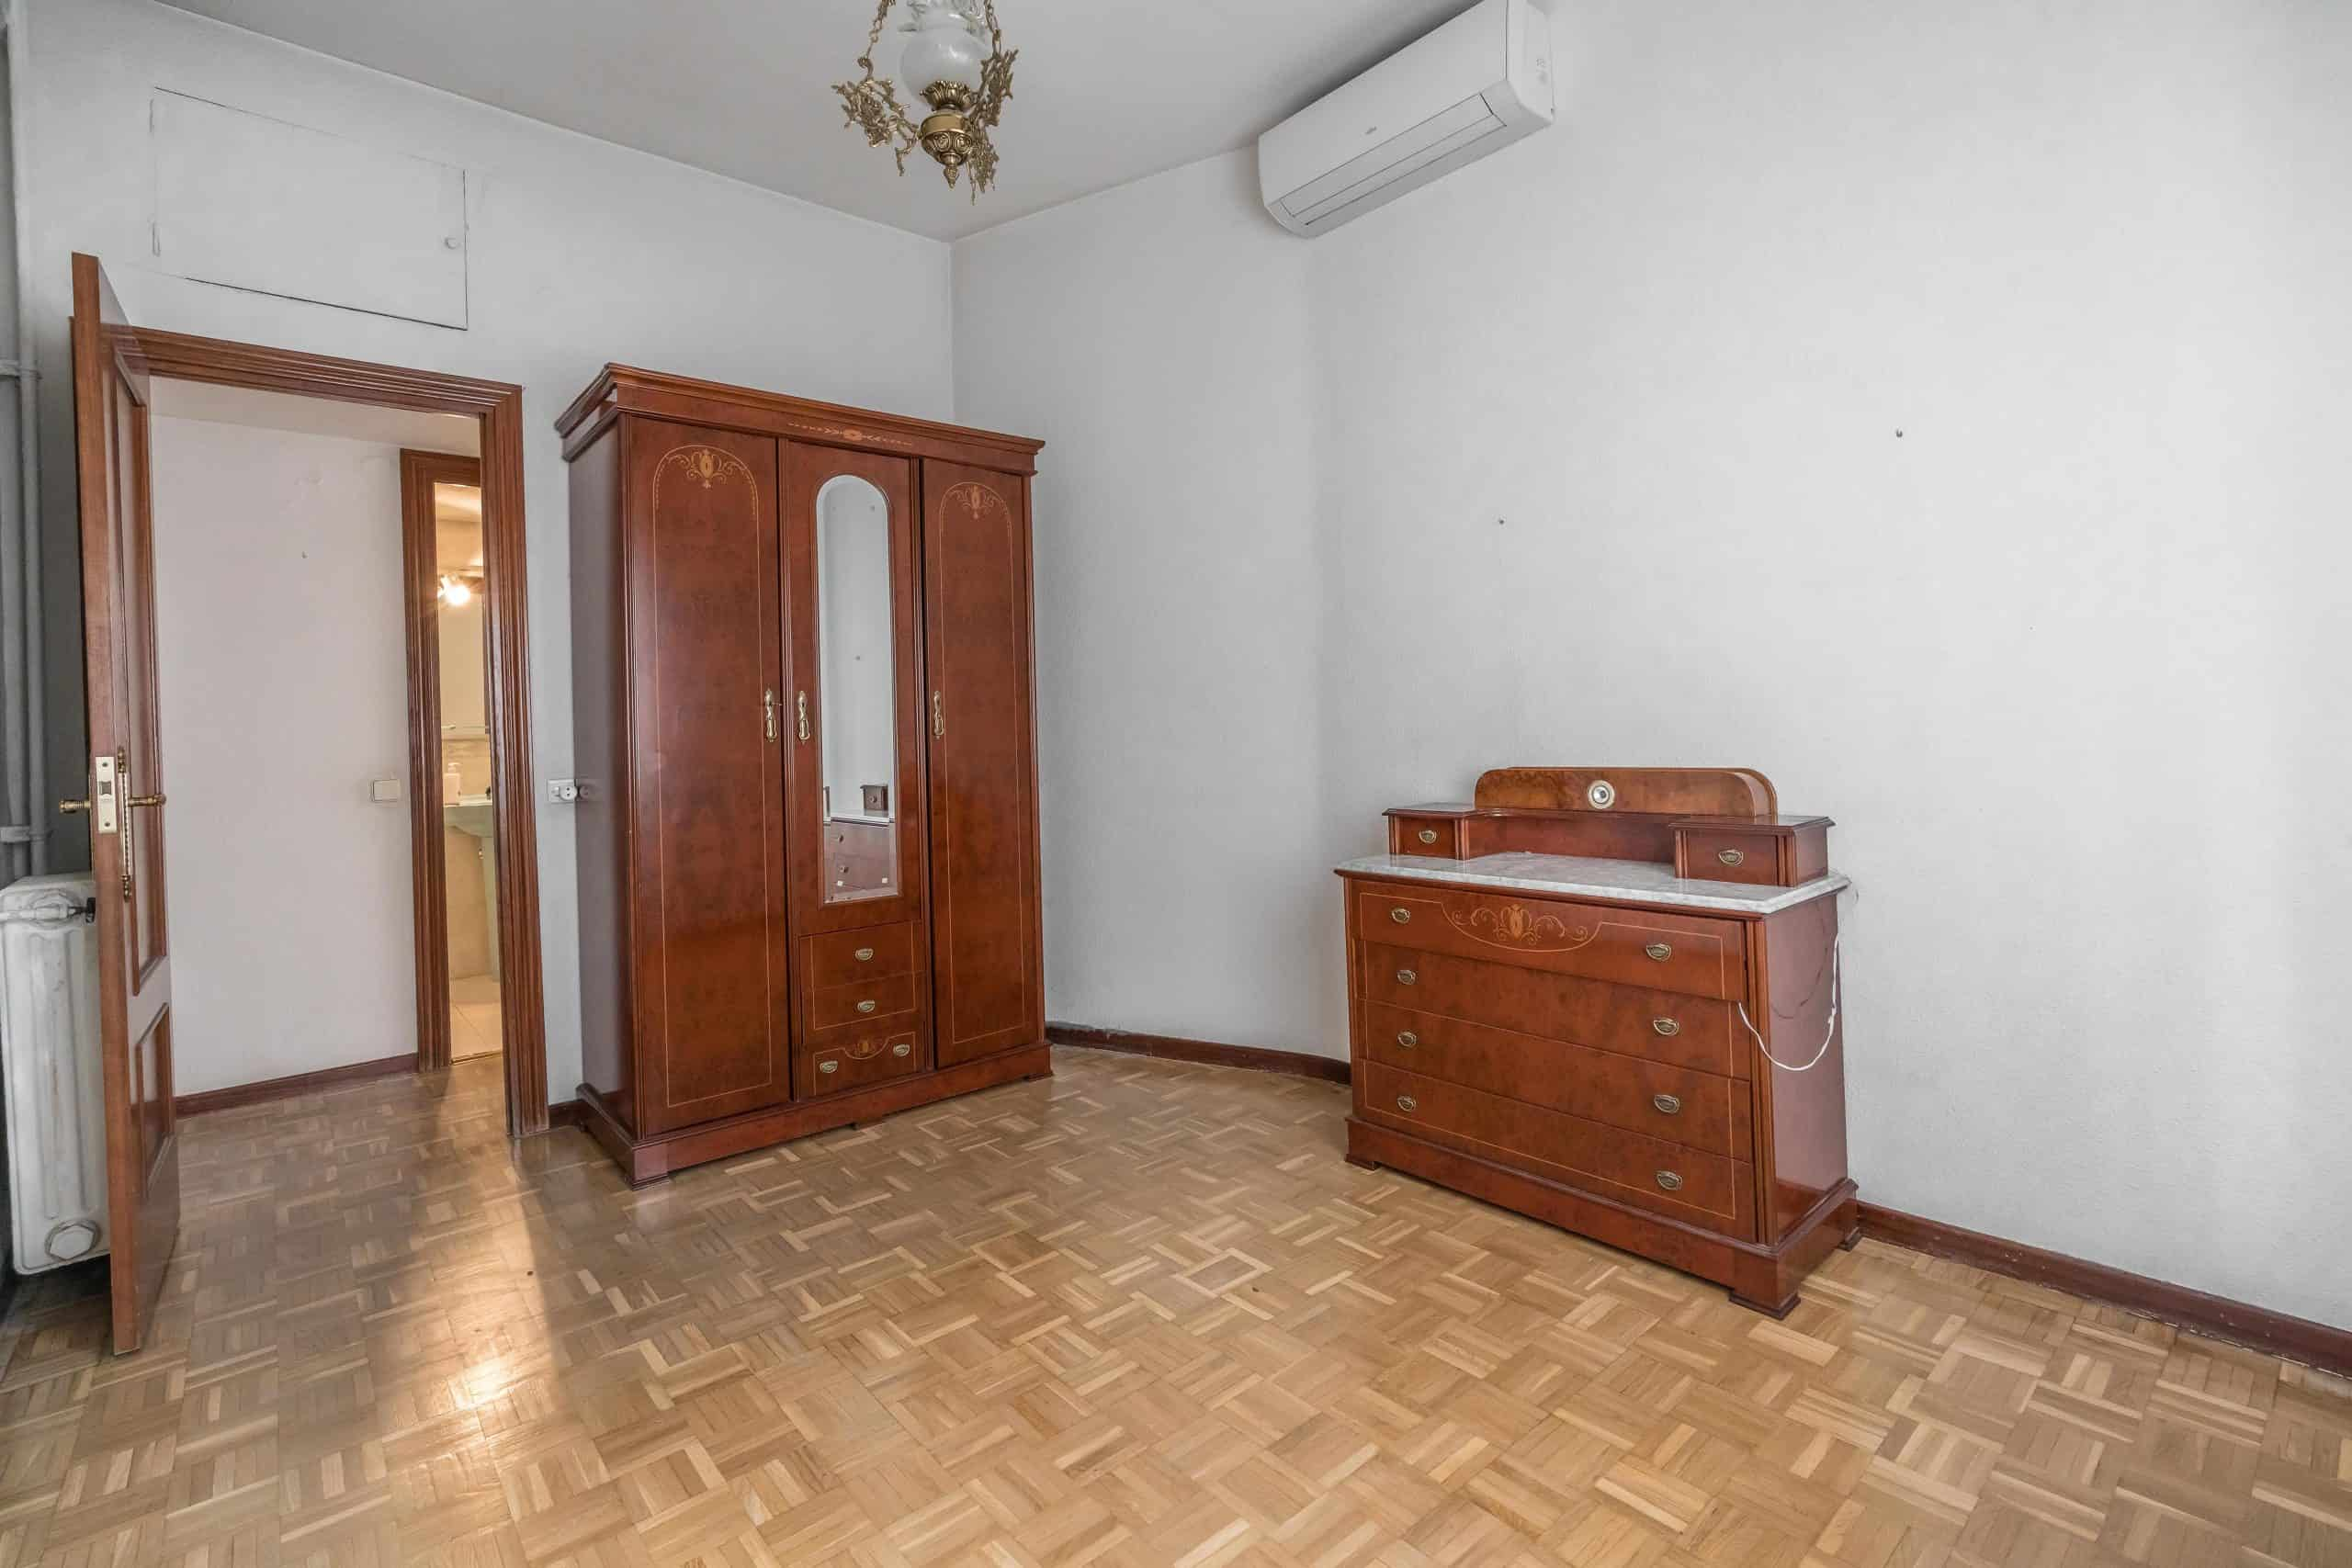 Agencia Inmobiliaria de Madrid-FUTUROCASA-Zona ARGANZUELA-LEGAZPI -calle Jaime Conquistador 48- 1er Dormitorio 4